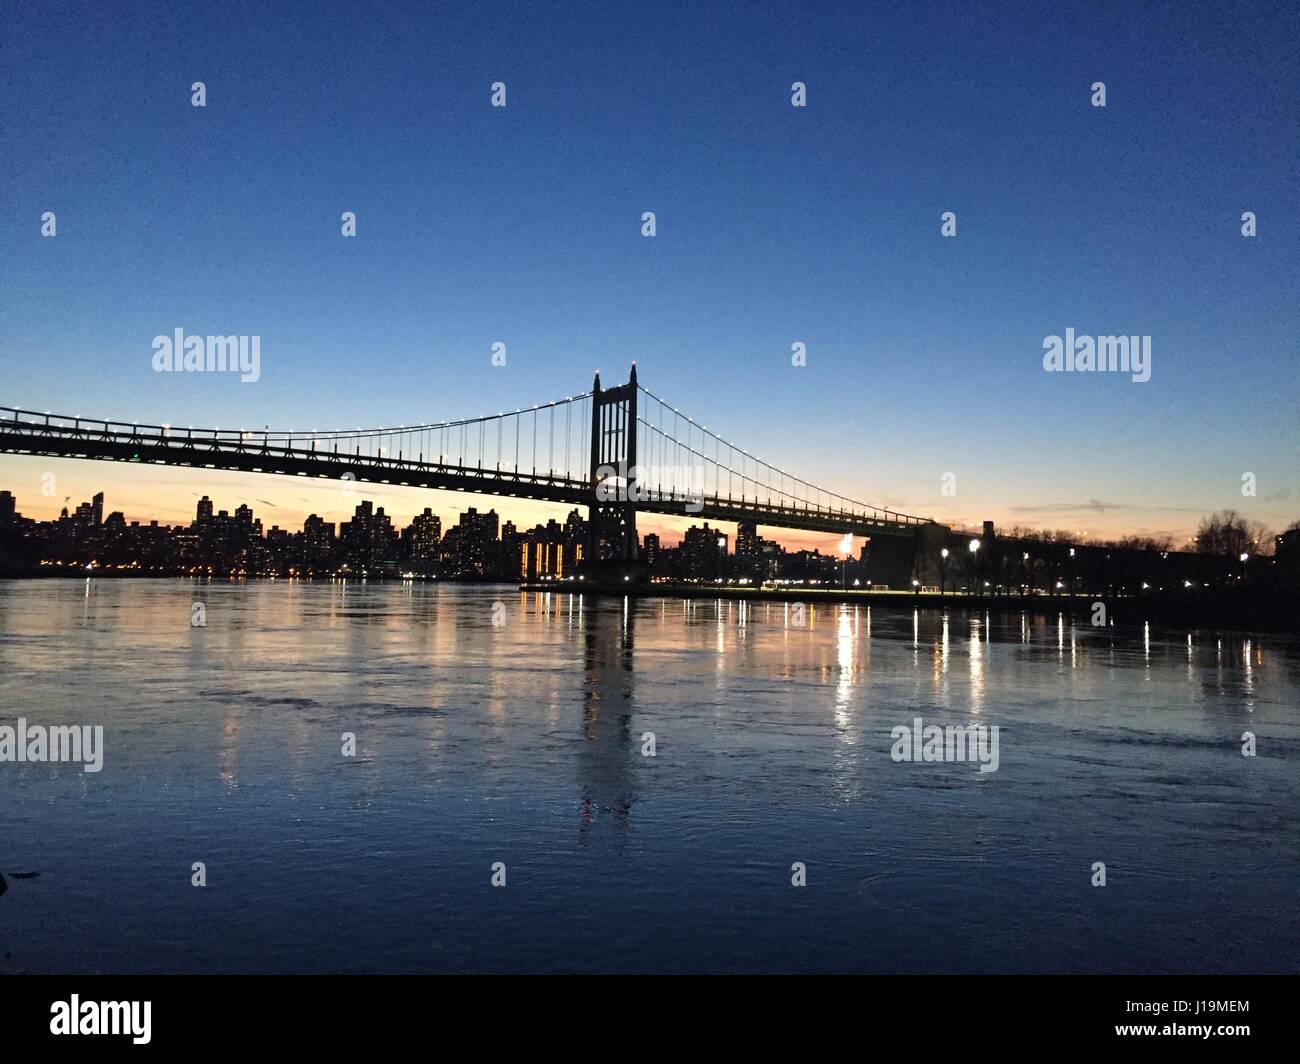 RFK Triborough Bridge - Stock Image